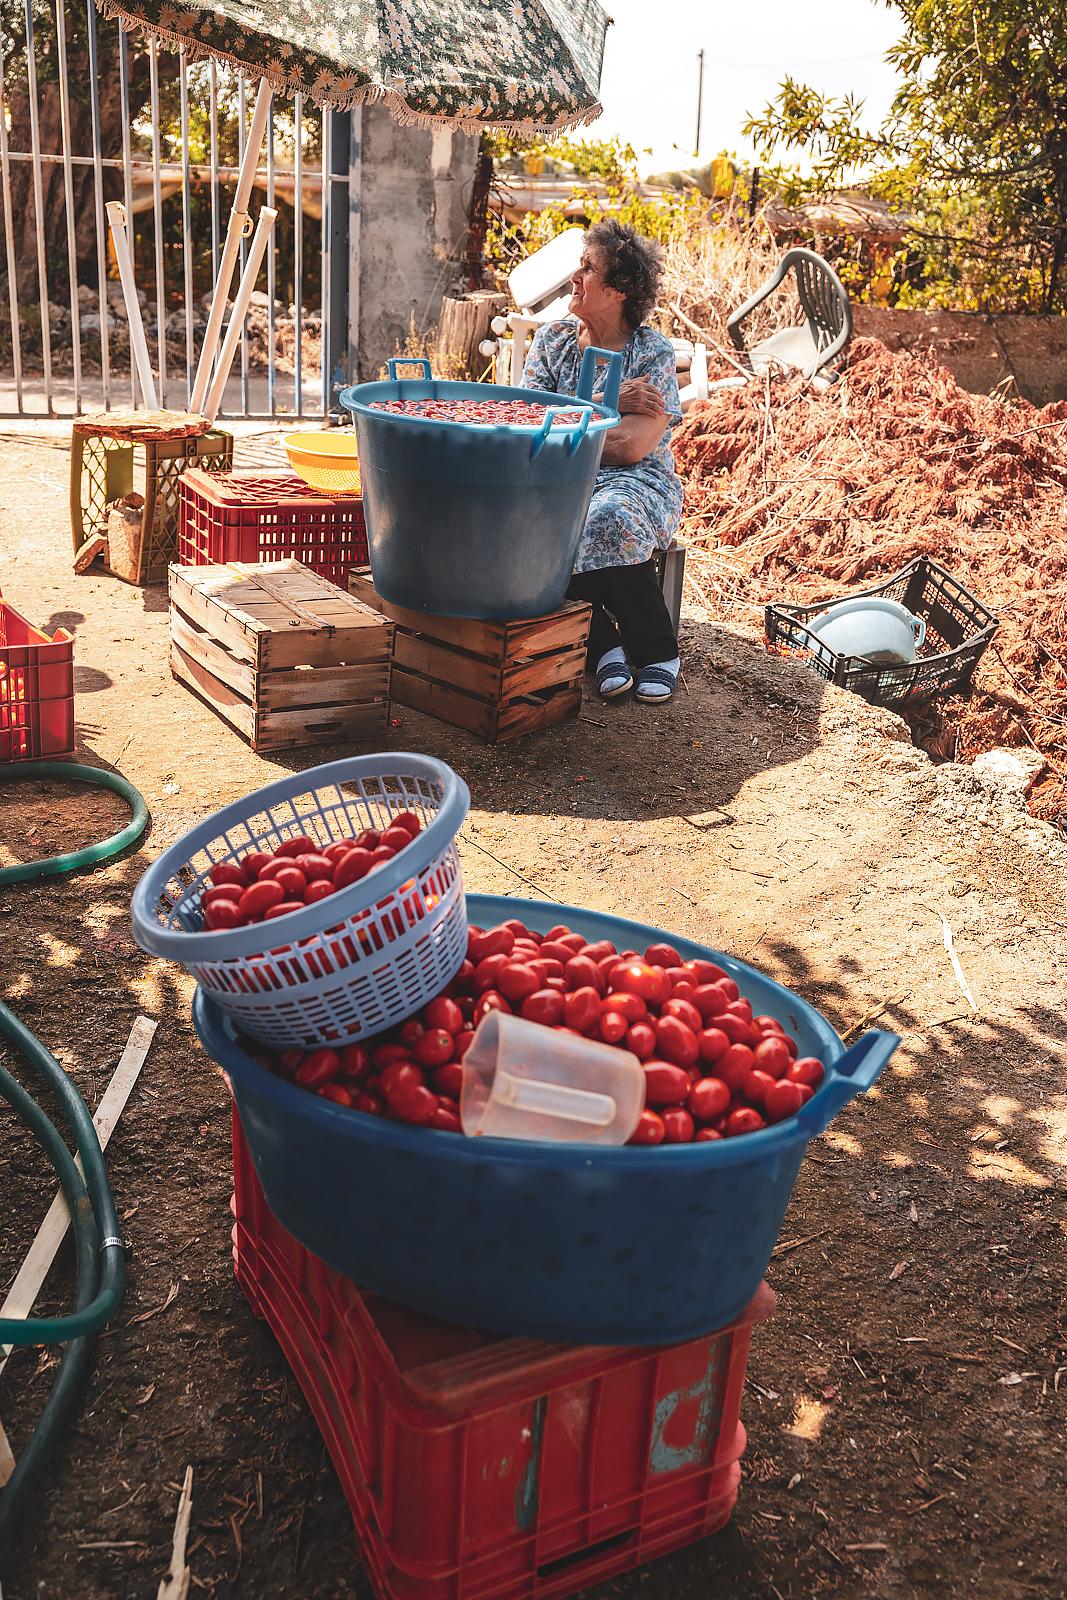 Making of tomato sauce